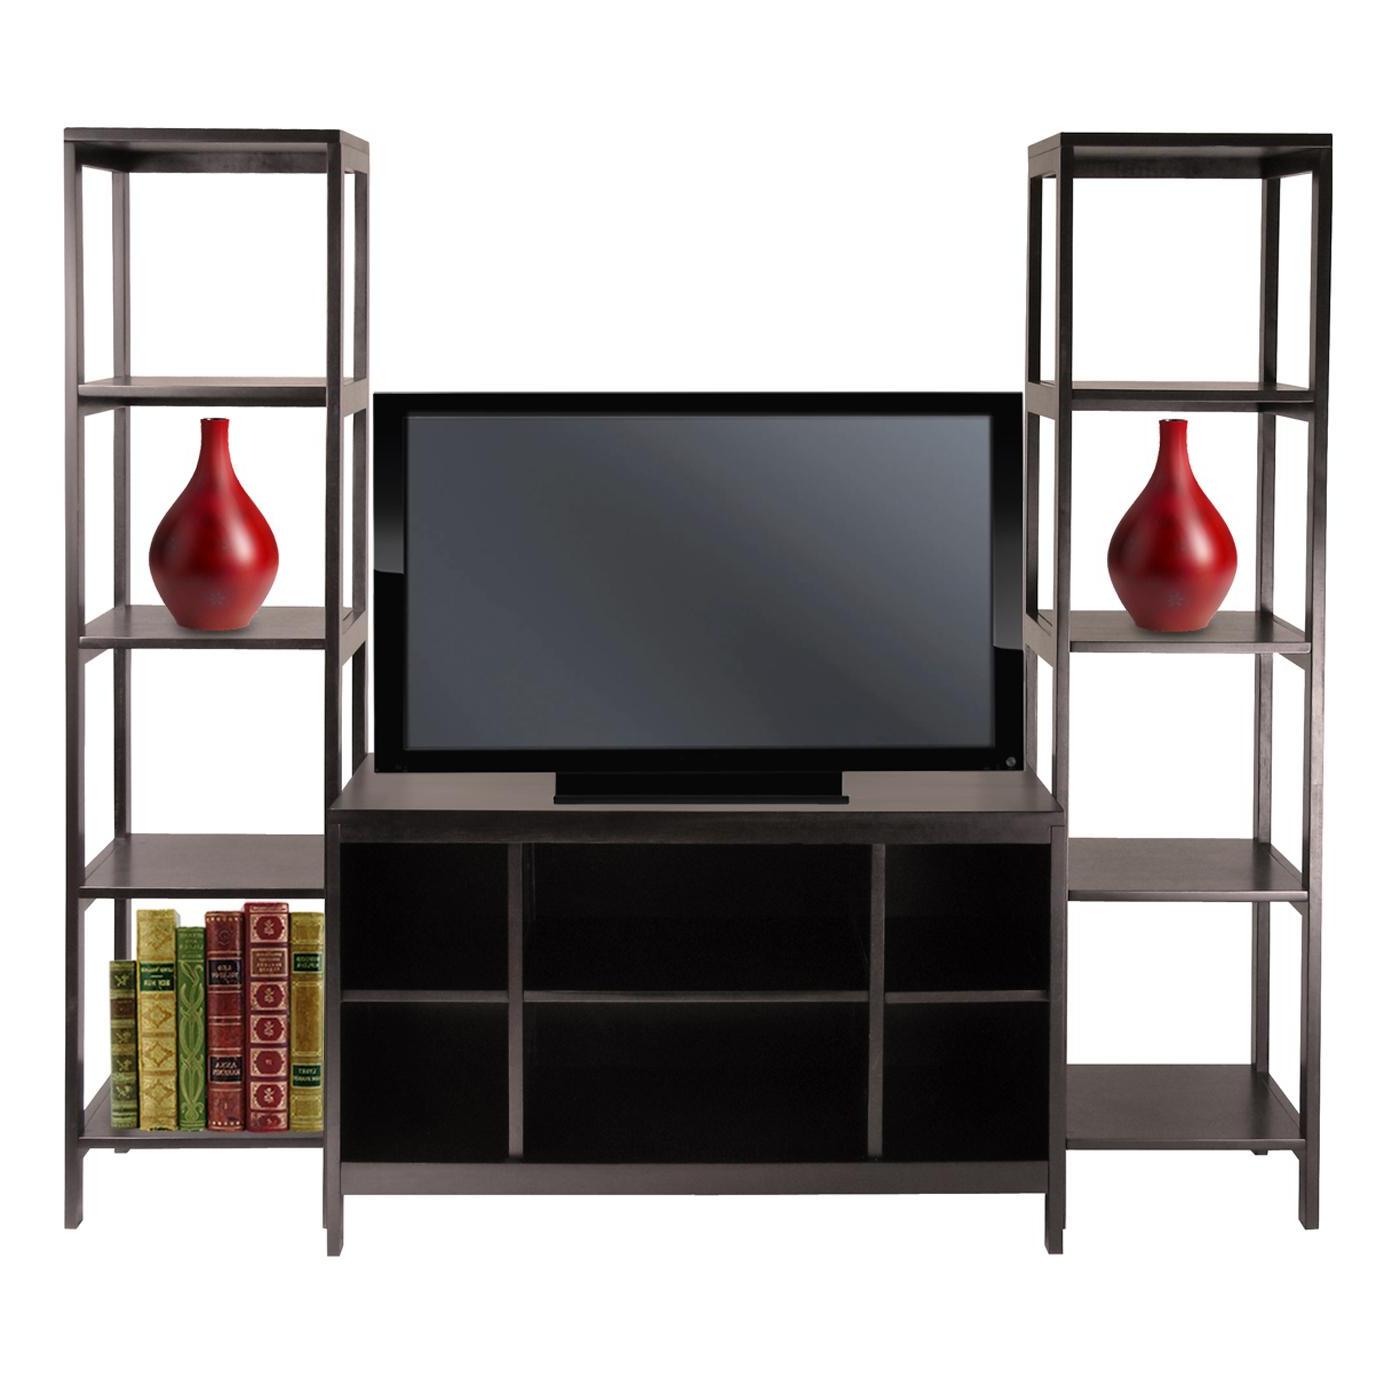 Diy Bookshelf Tv Stand — Home Decorcoppercreekgroup : Bookshelf For Latest Tv Stands And Bookshelf (View 19 of 20)